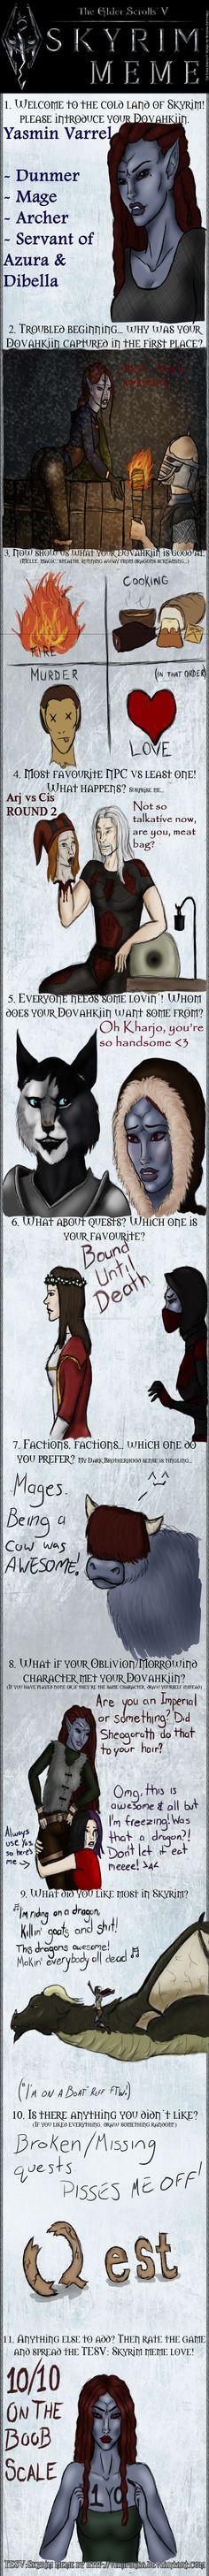 Skyrim Meme by RavenJeanGrey on DeviantArt